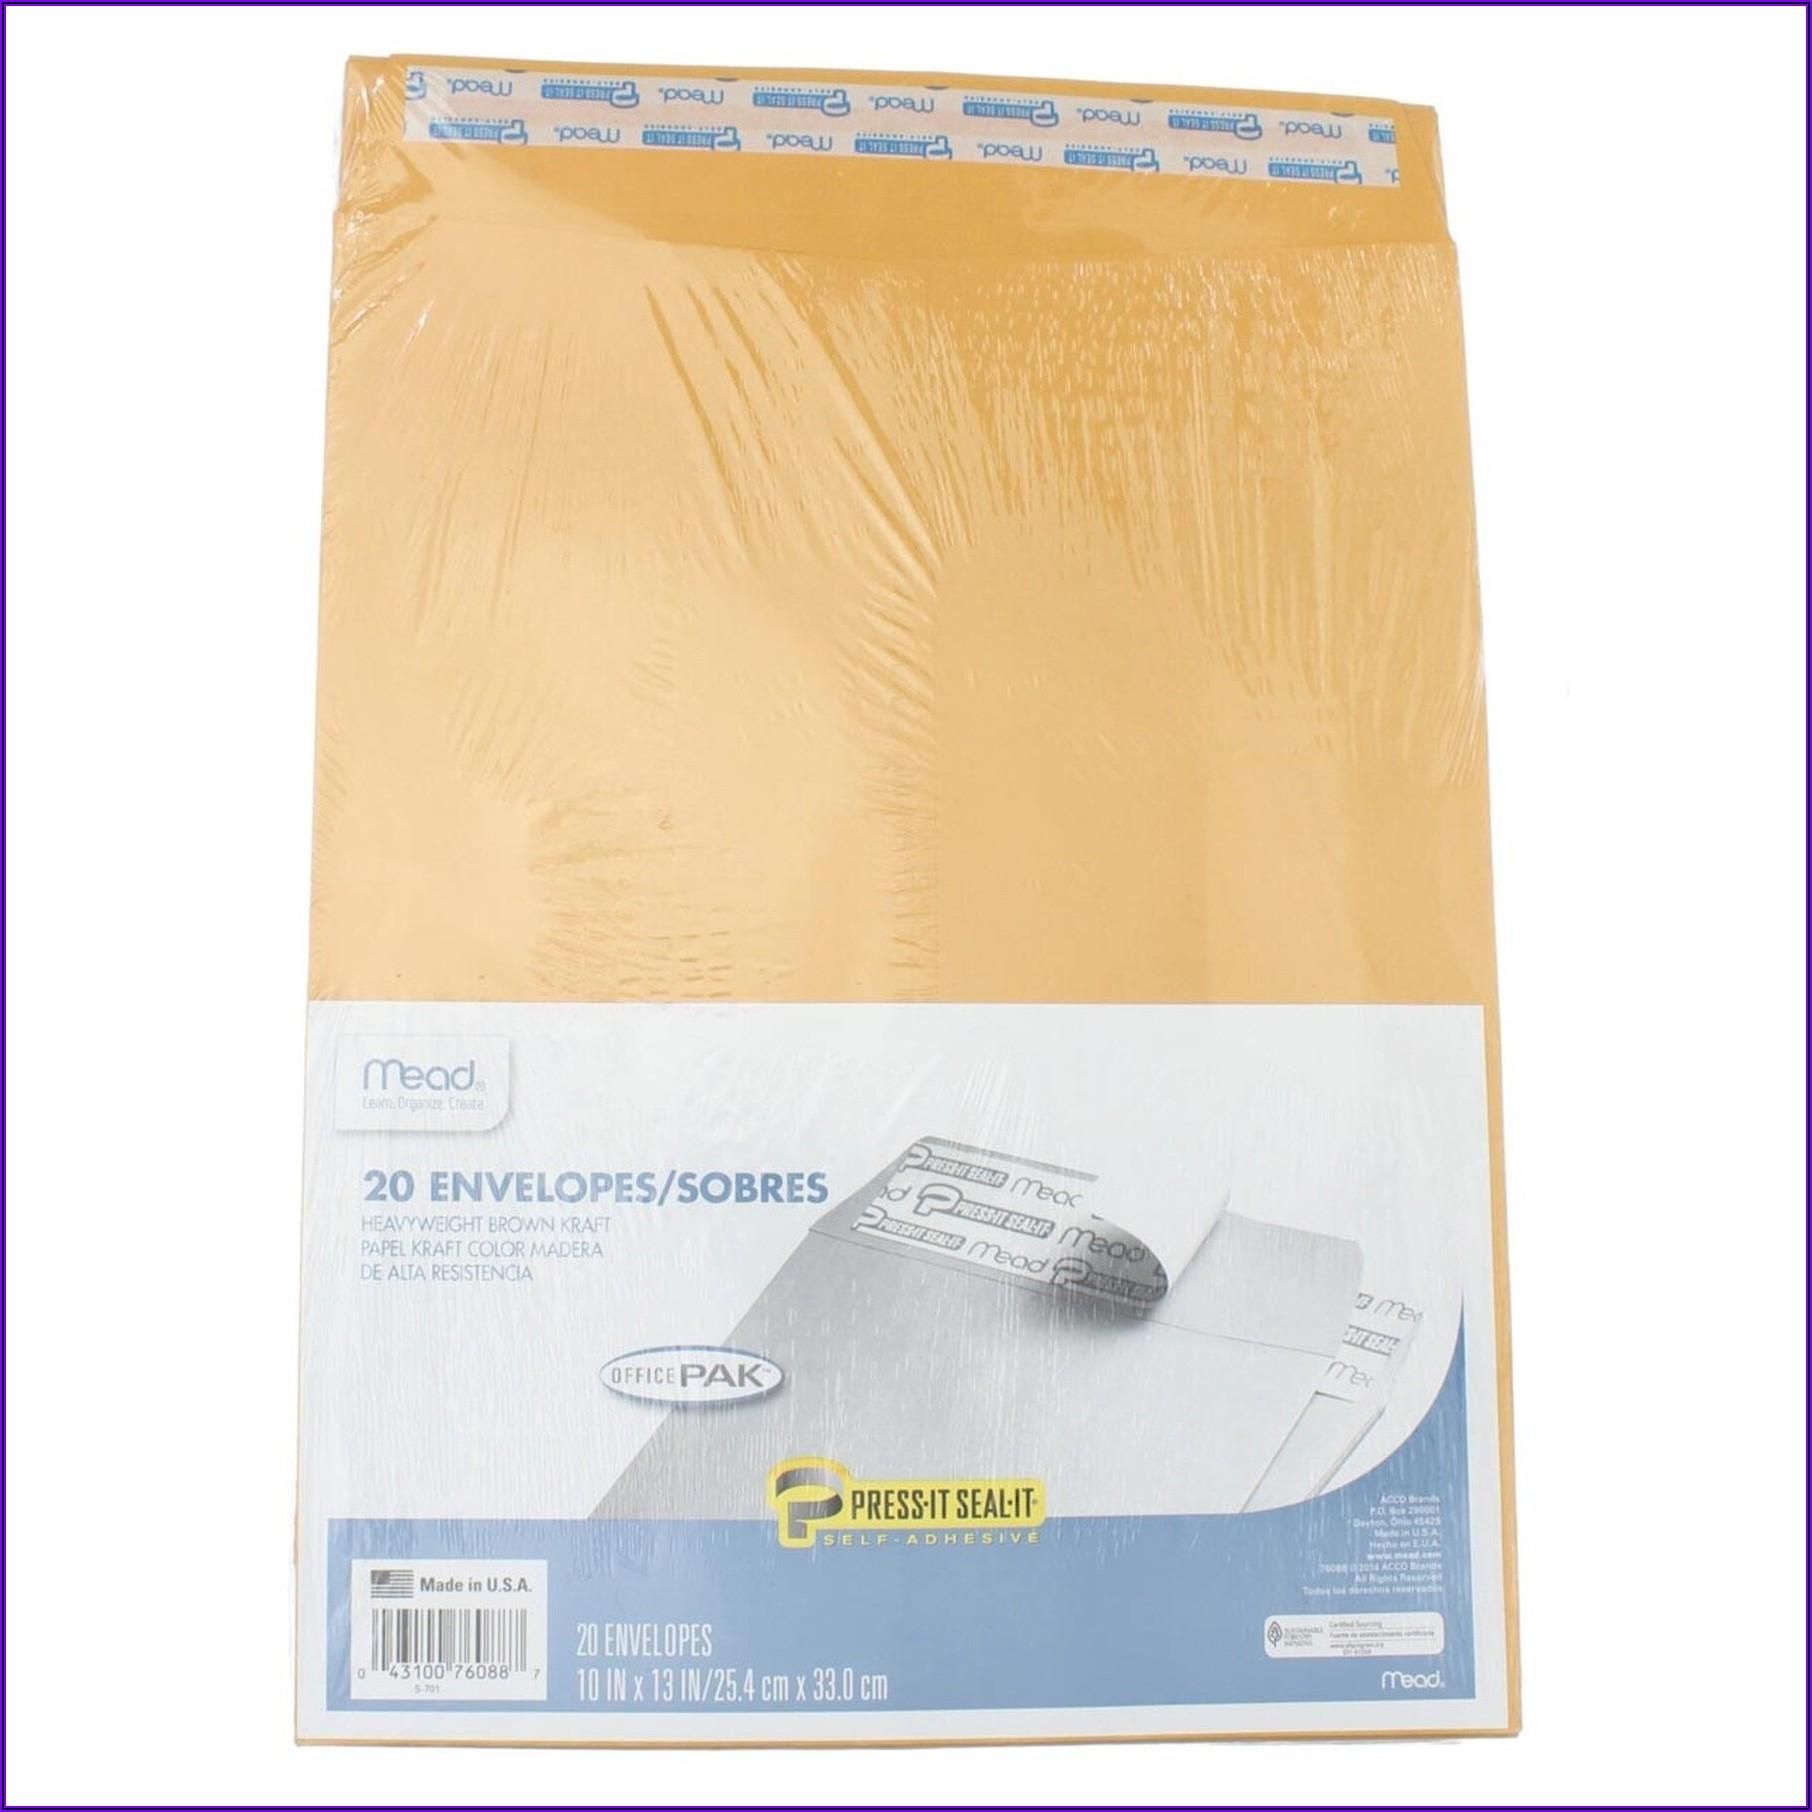 Mead Press It Seal It Envelopes